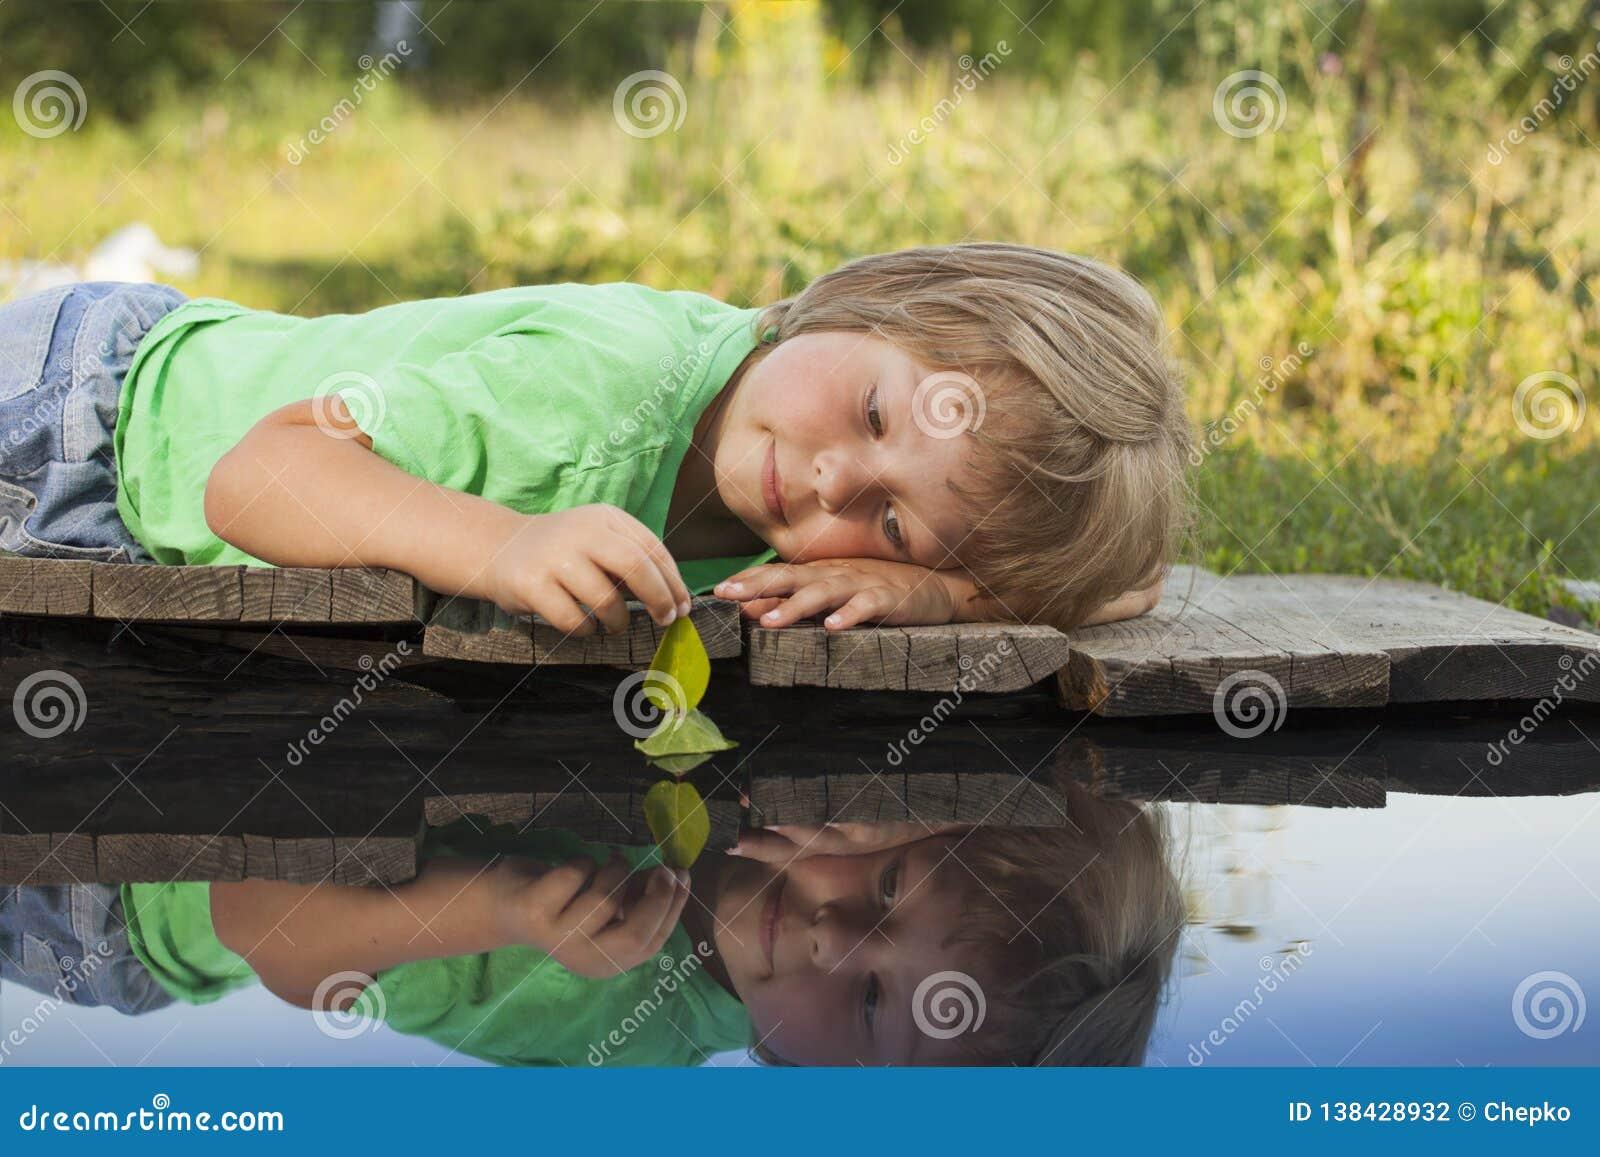 Det gröna blad-skeppet i barnhand i vatten, pojke parkerar in lek med fartyget i floden